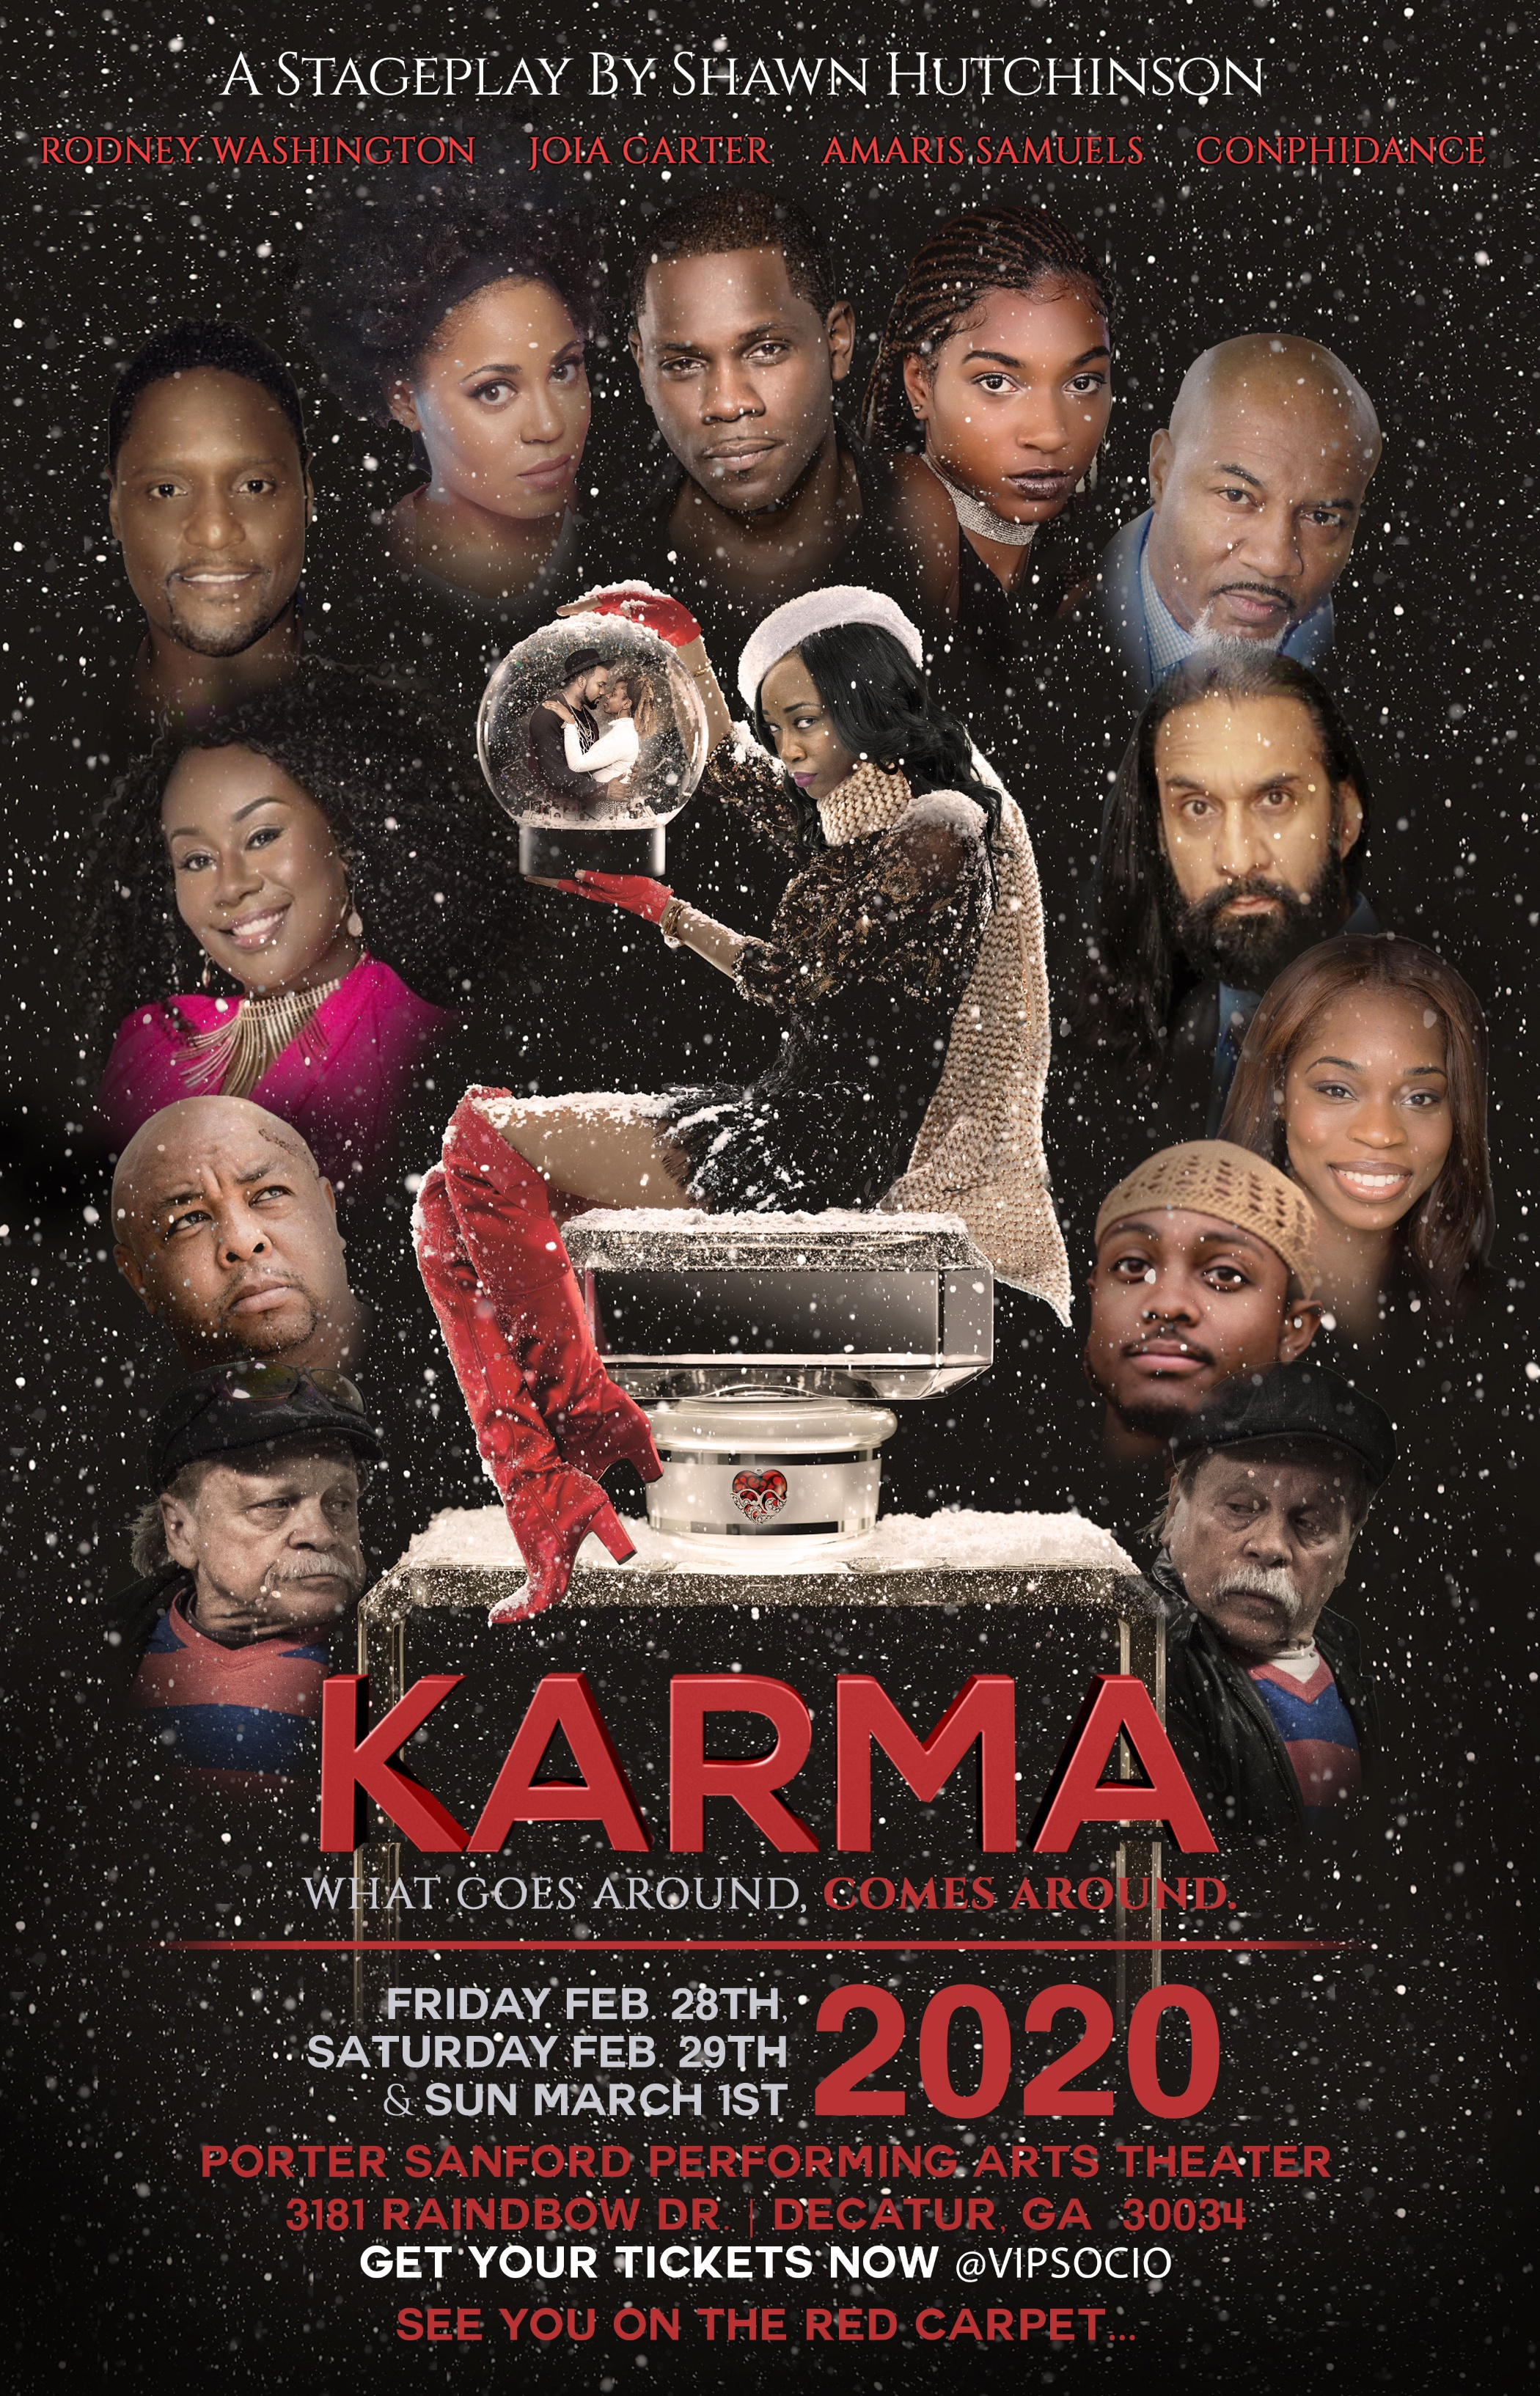 Karma The Stage Play